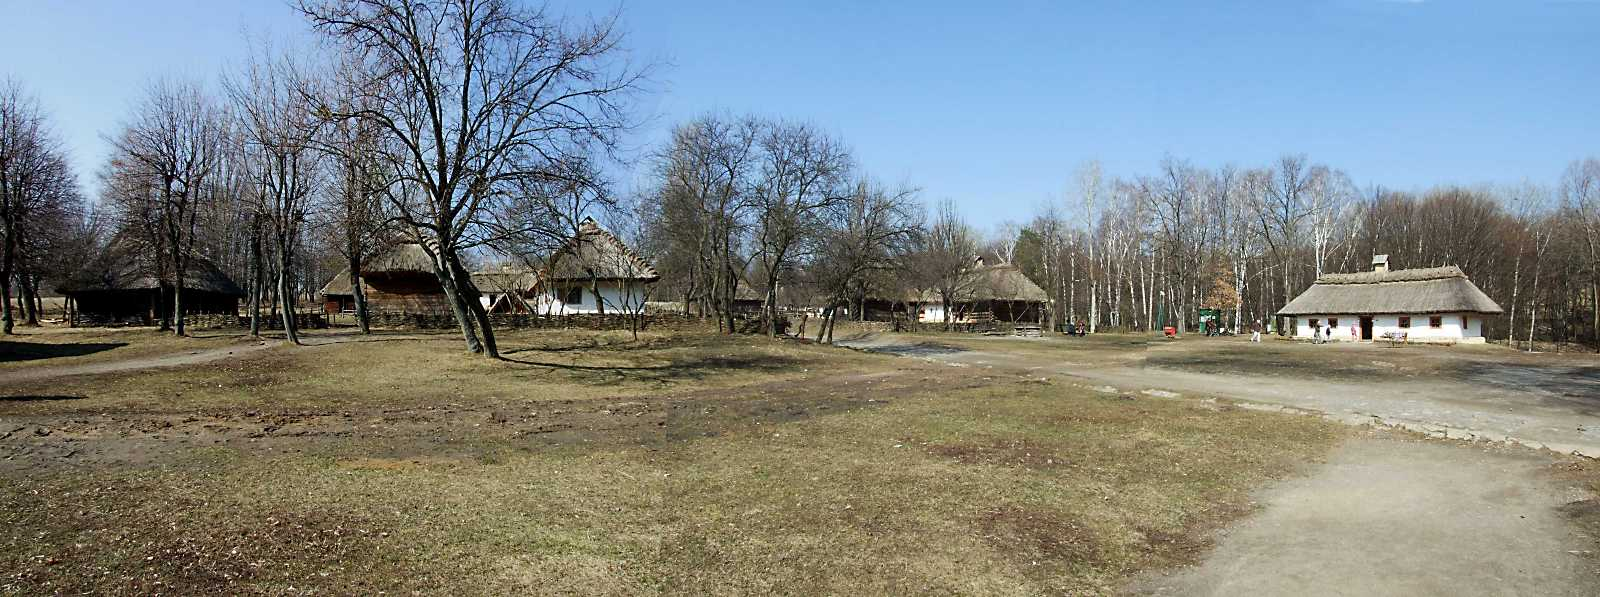 2011 р. Панорама площі села (садиби 6,…